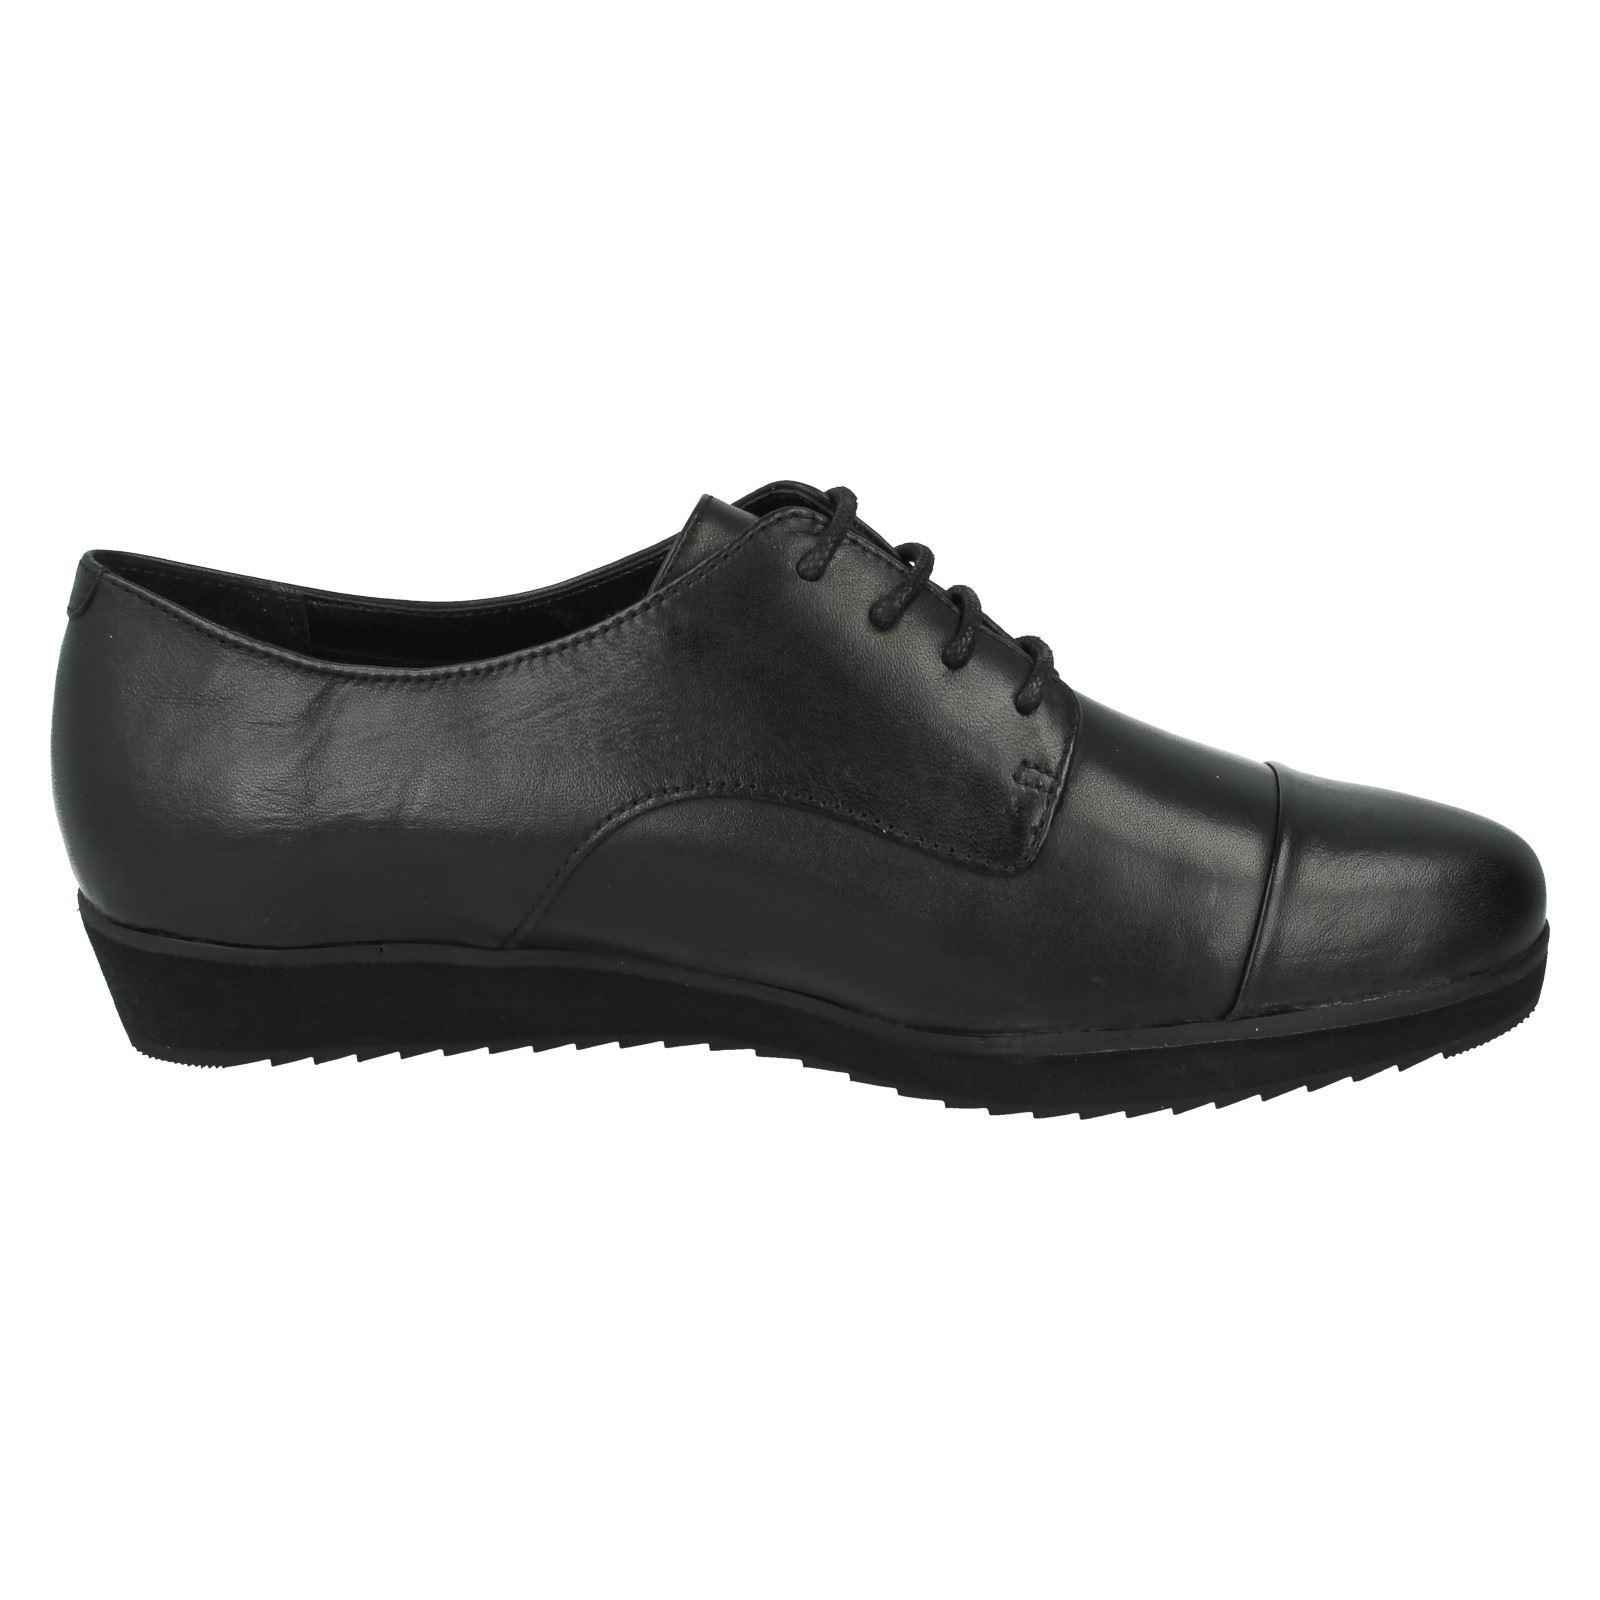 clark's work shoes ladies